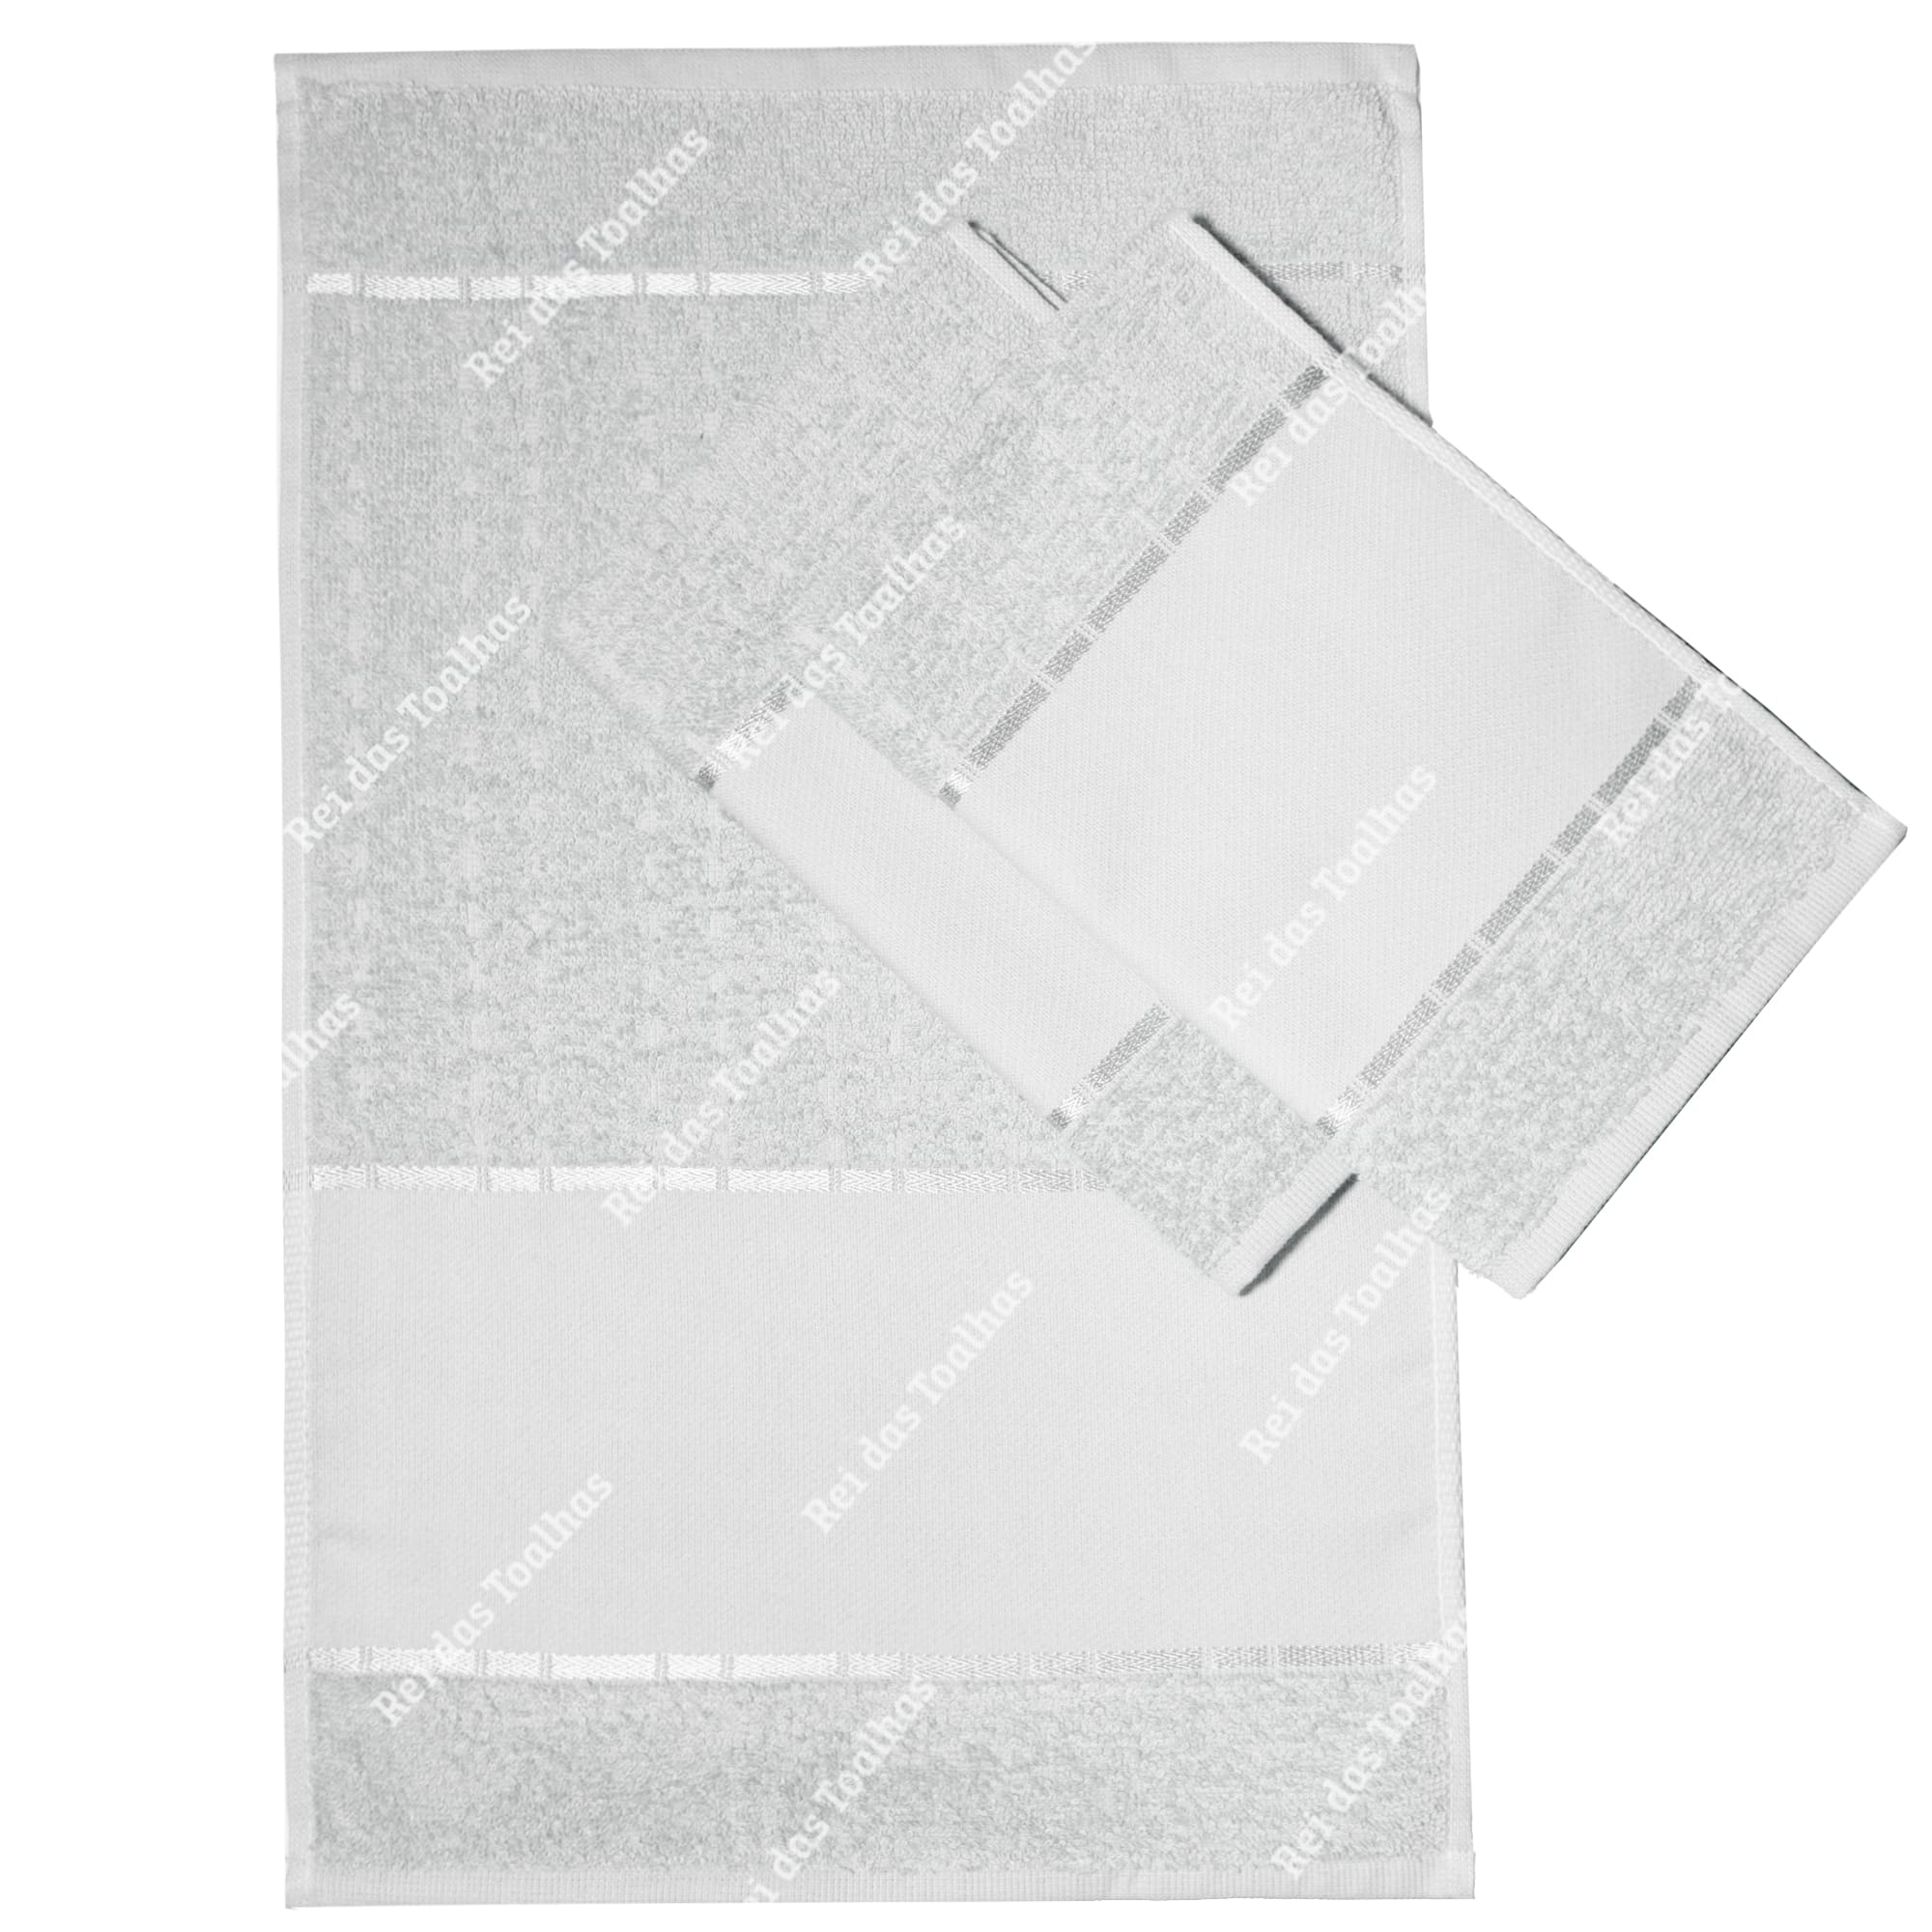 Kit Com 12 Lavabos Felpudo Para Pintar Multi Arte 30cmx45cm DOHLER